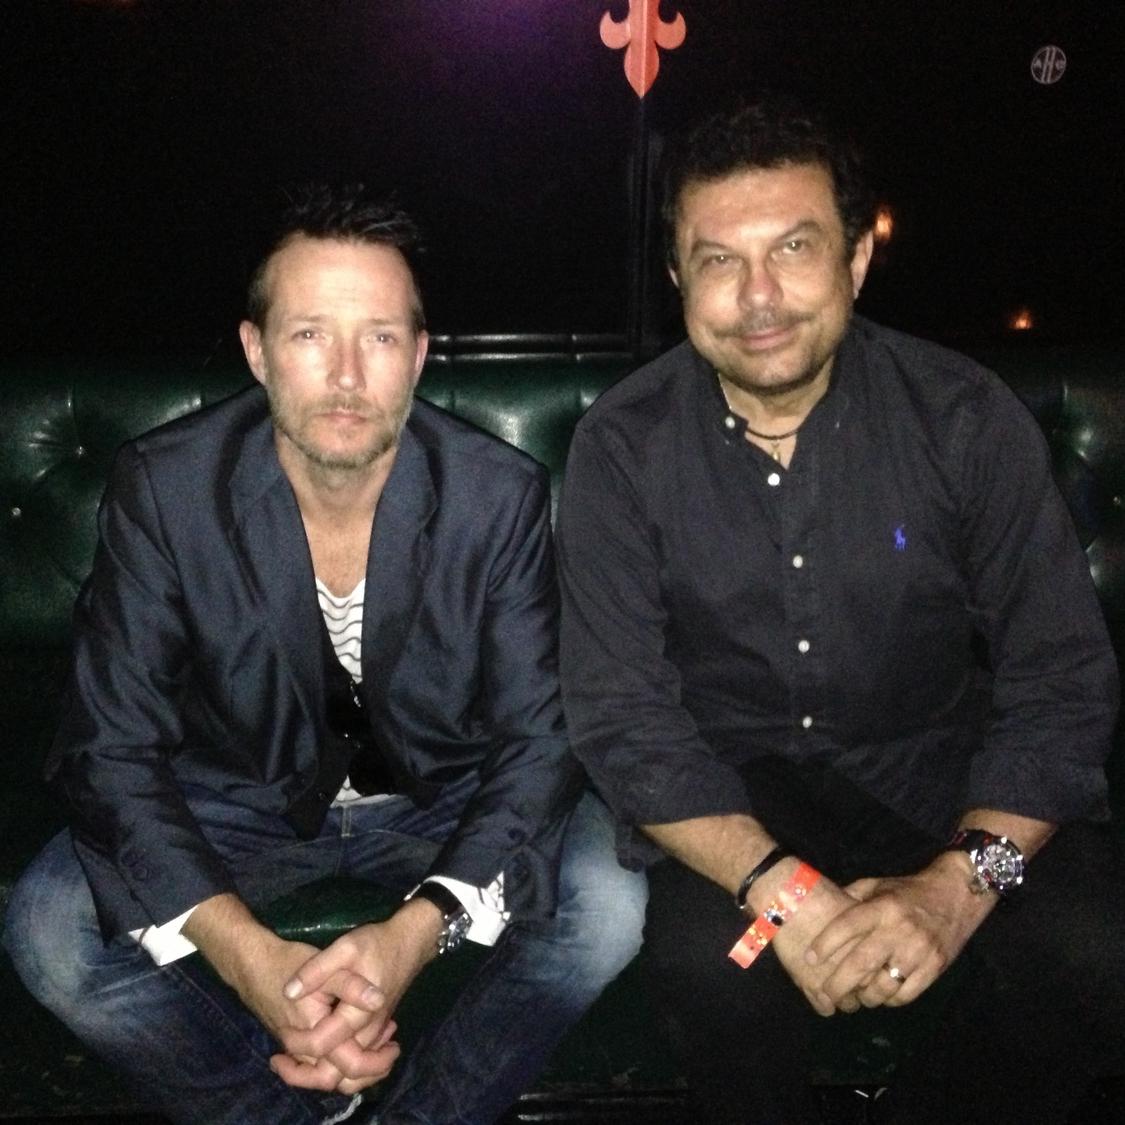 Joe Ippolito with Scott Weiland  (Stone Temple Pilots, Velvet Revolver)